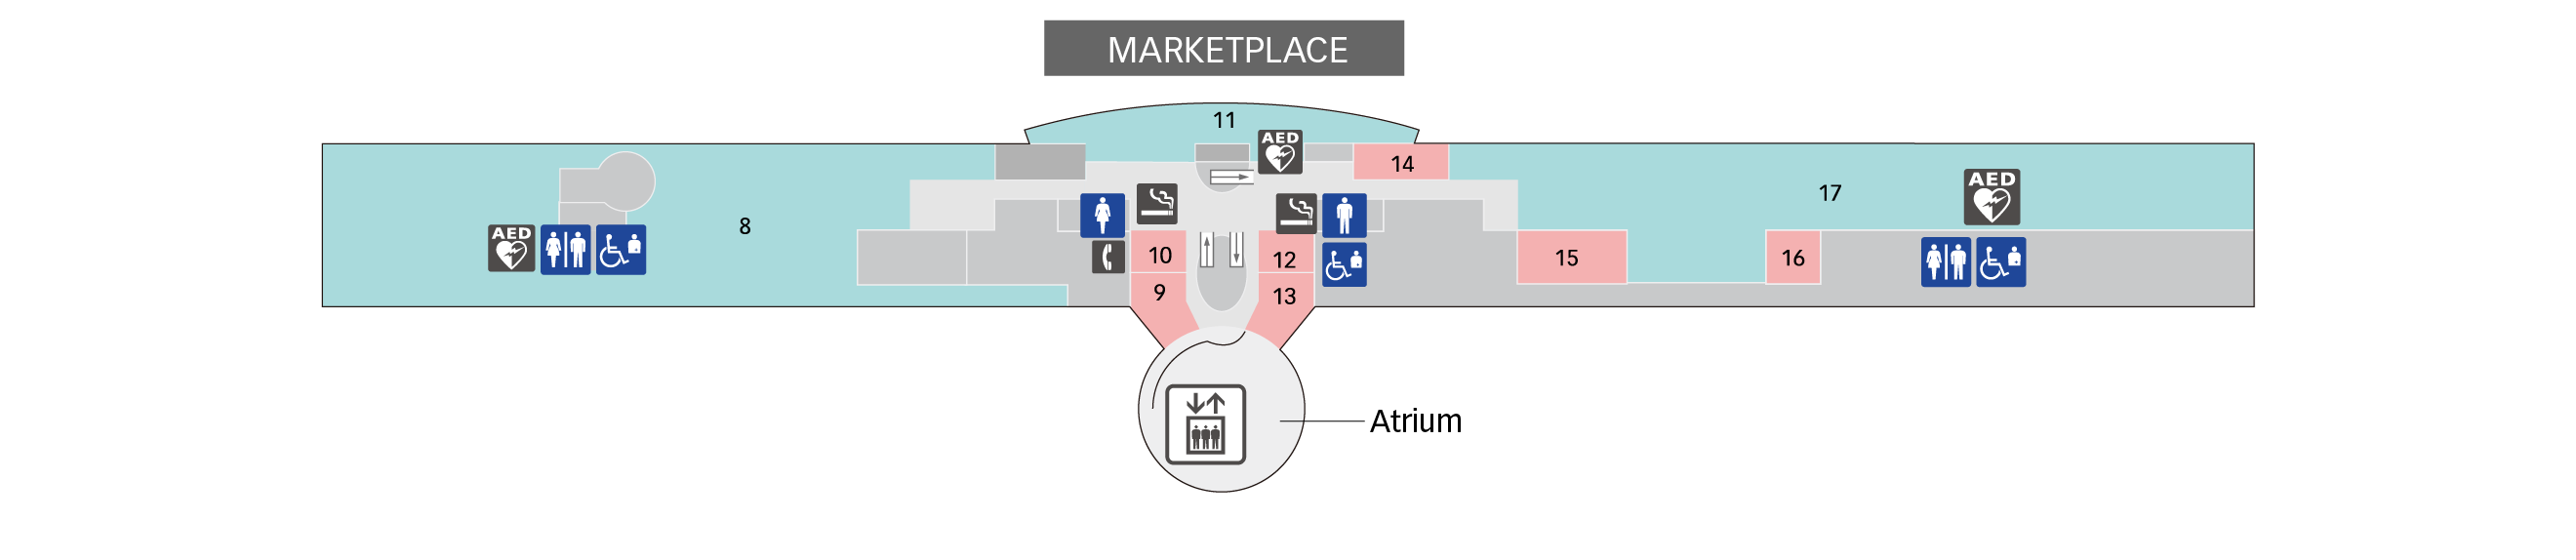 5F Restaurant /Observation Deck Floor Map